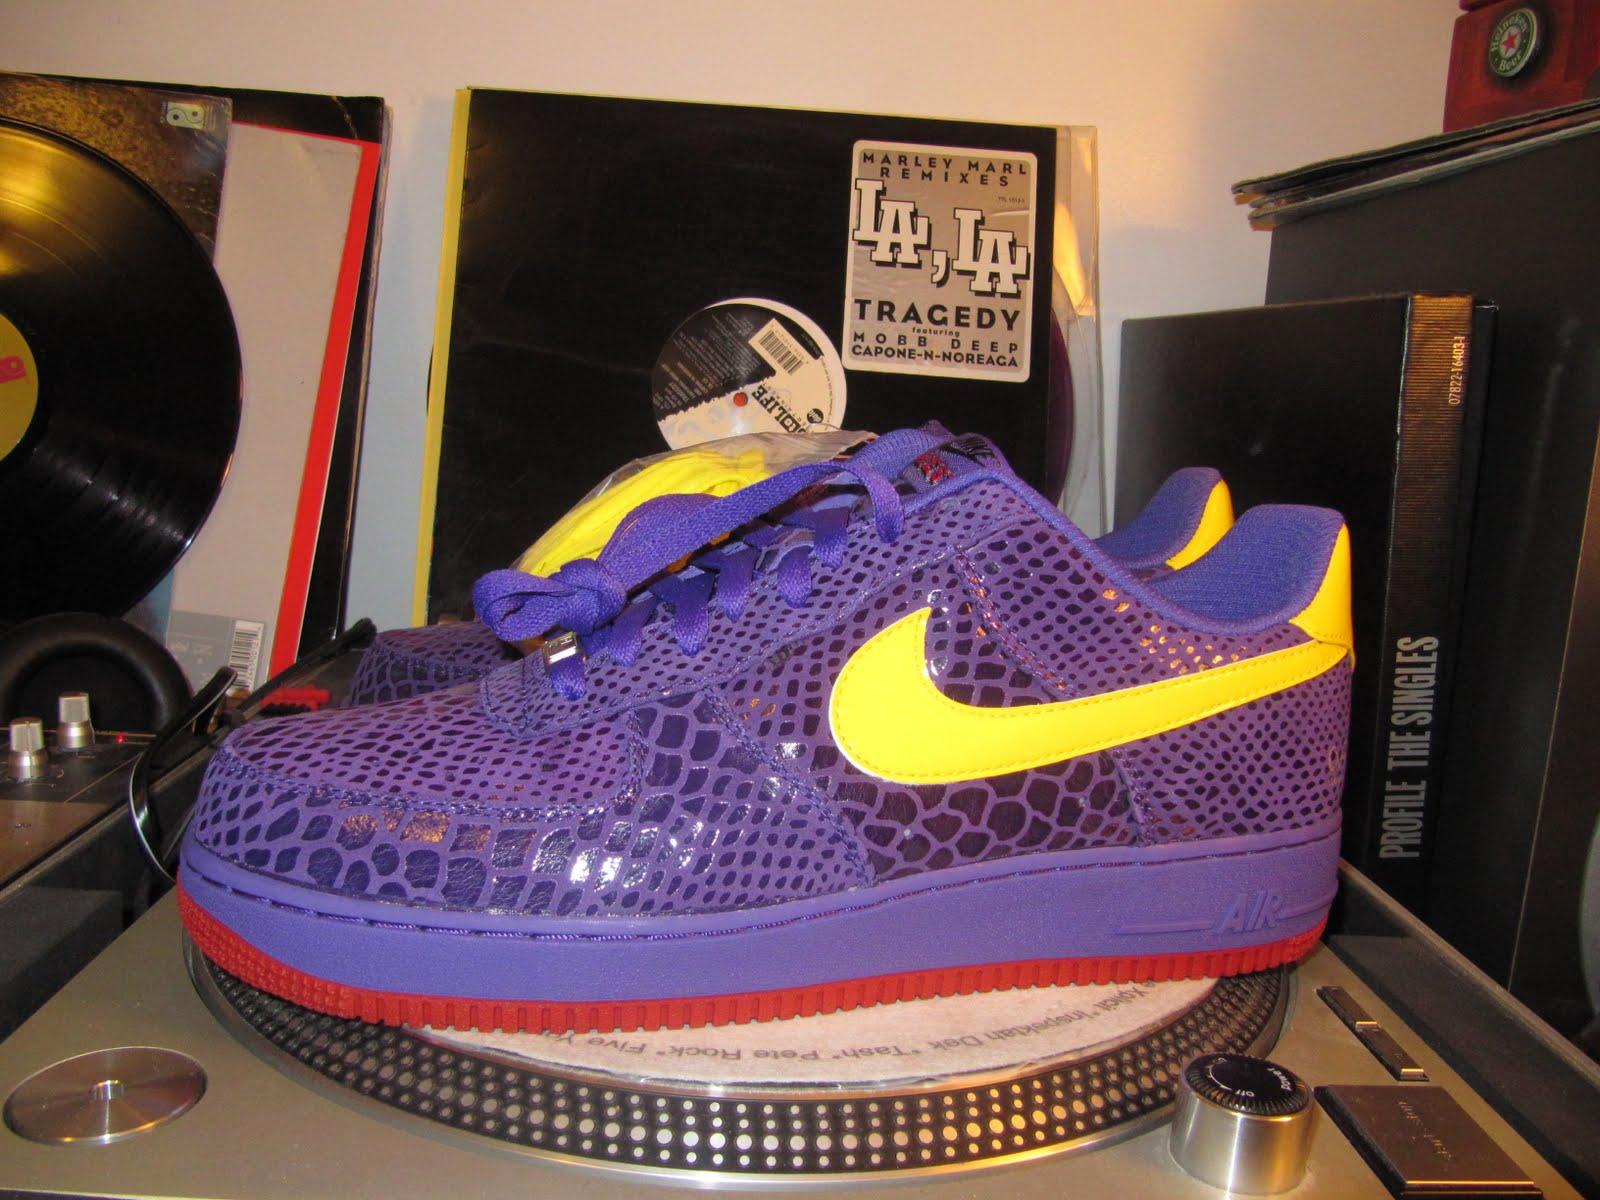 Nike Air Force 1 Livestrong x Mr. Cartoon Air Force 1's